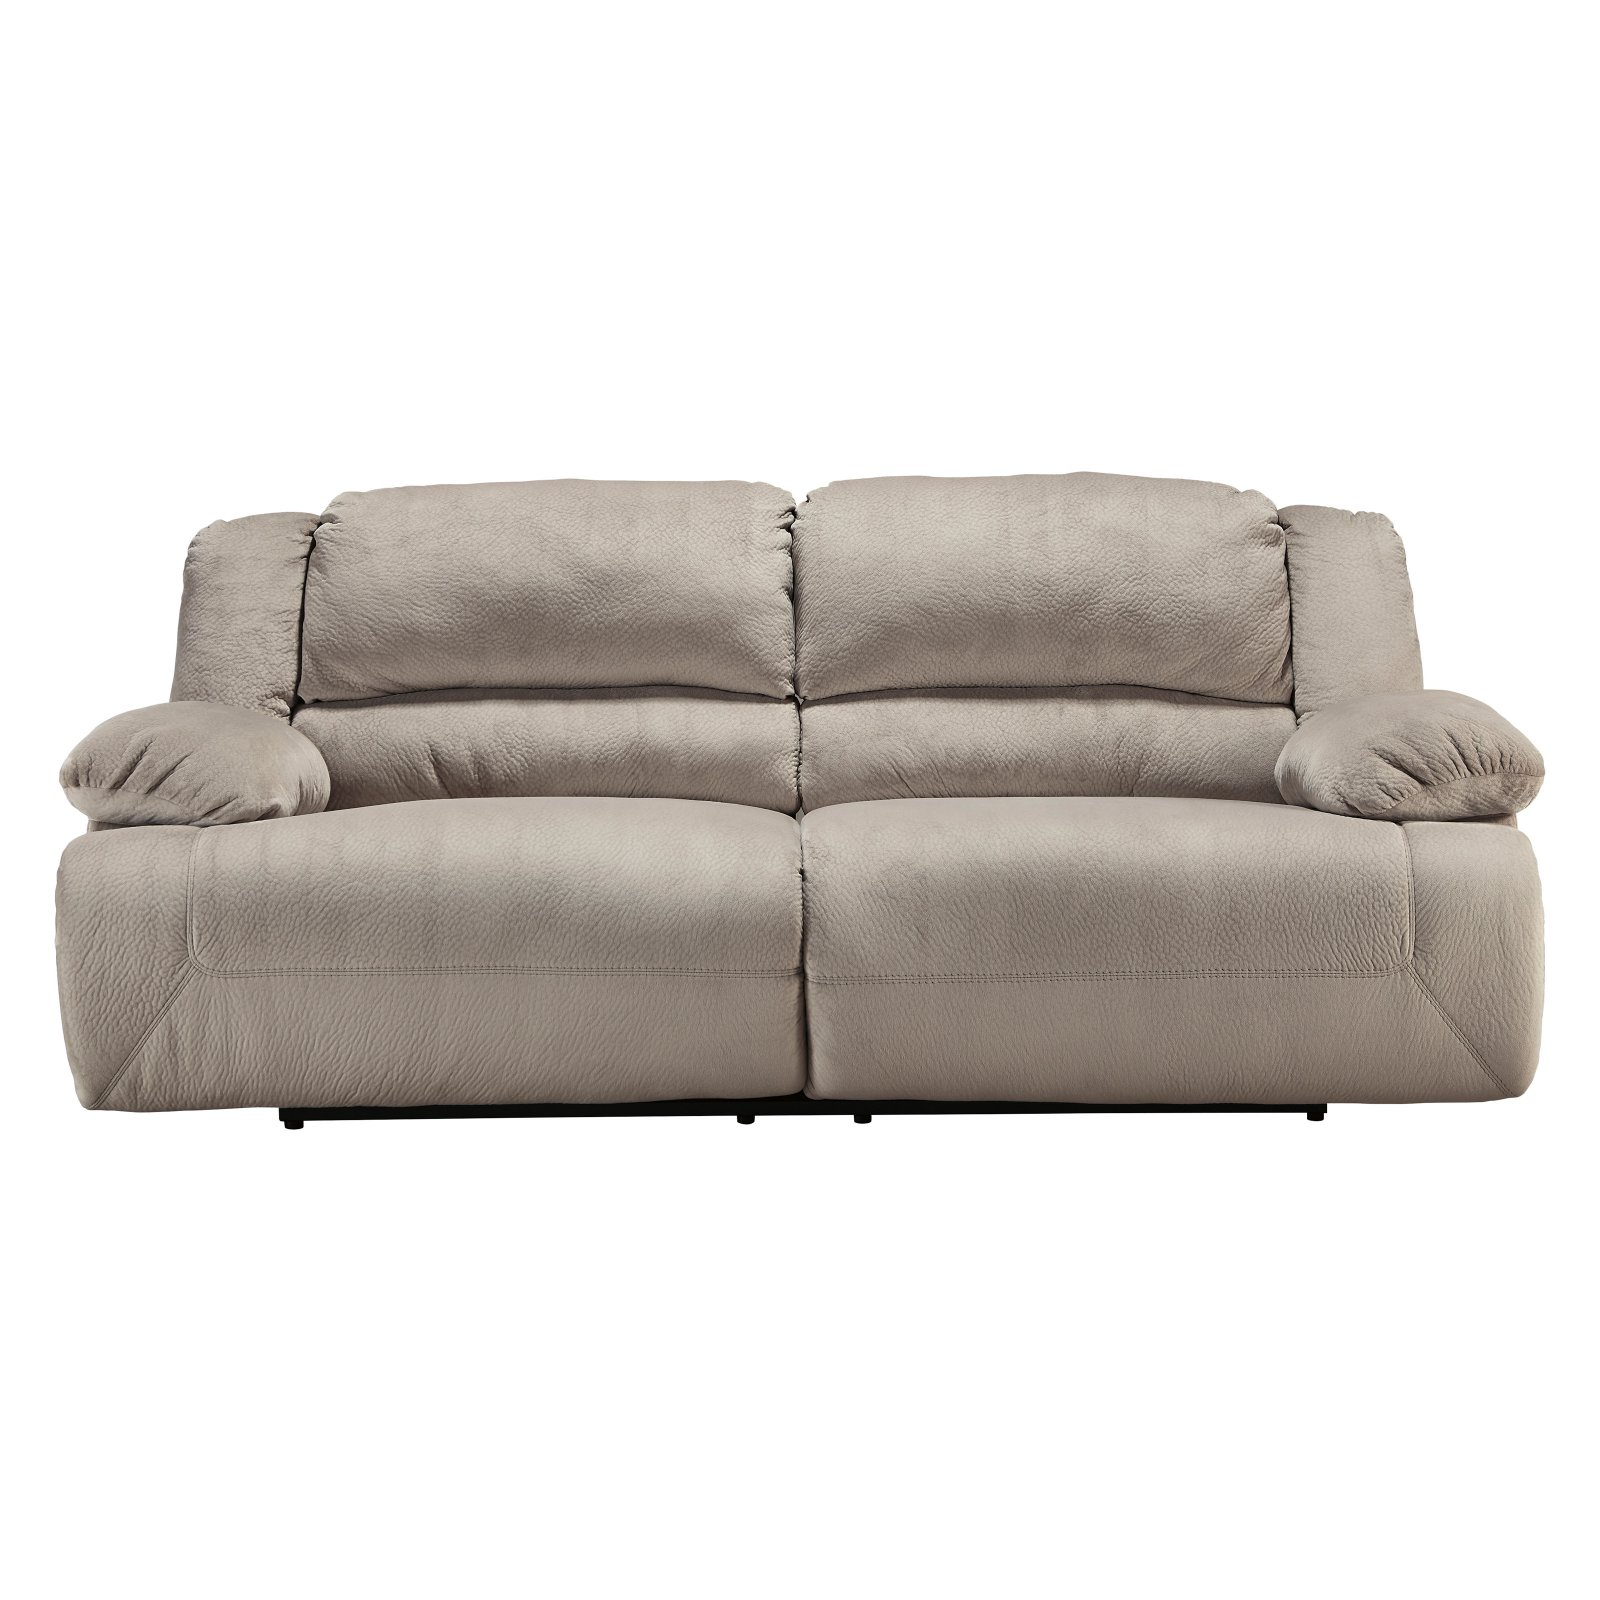 Signature Designashley Toletta Power Reclining Sofa Throughout Power Reclining Sofas (View 14 of 15)